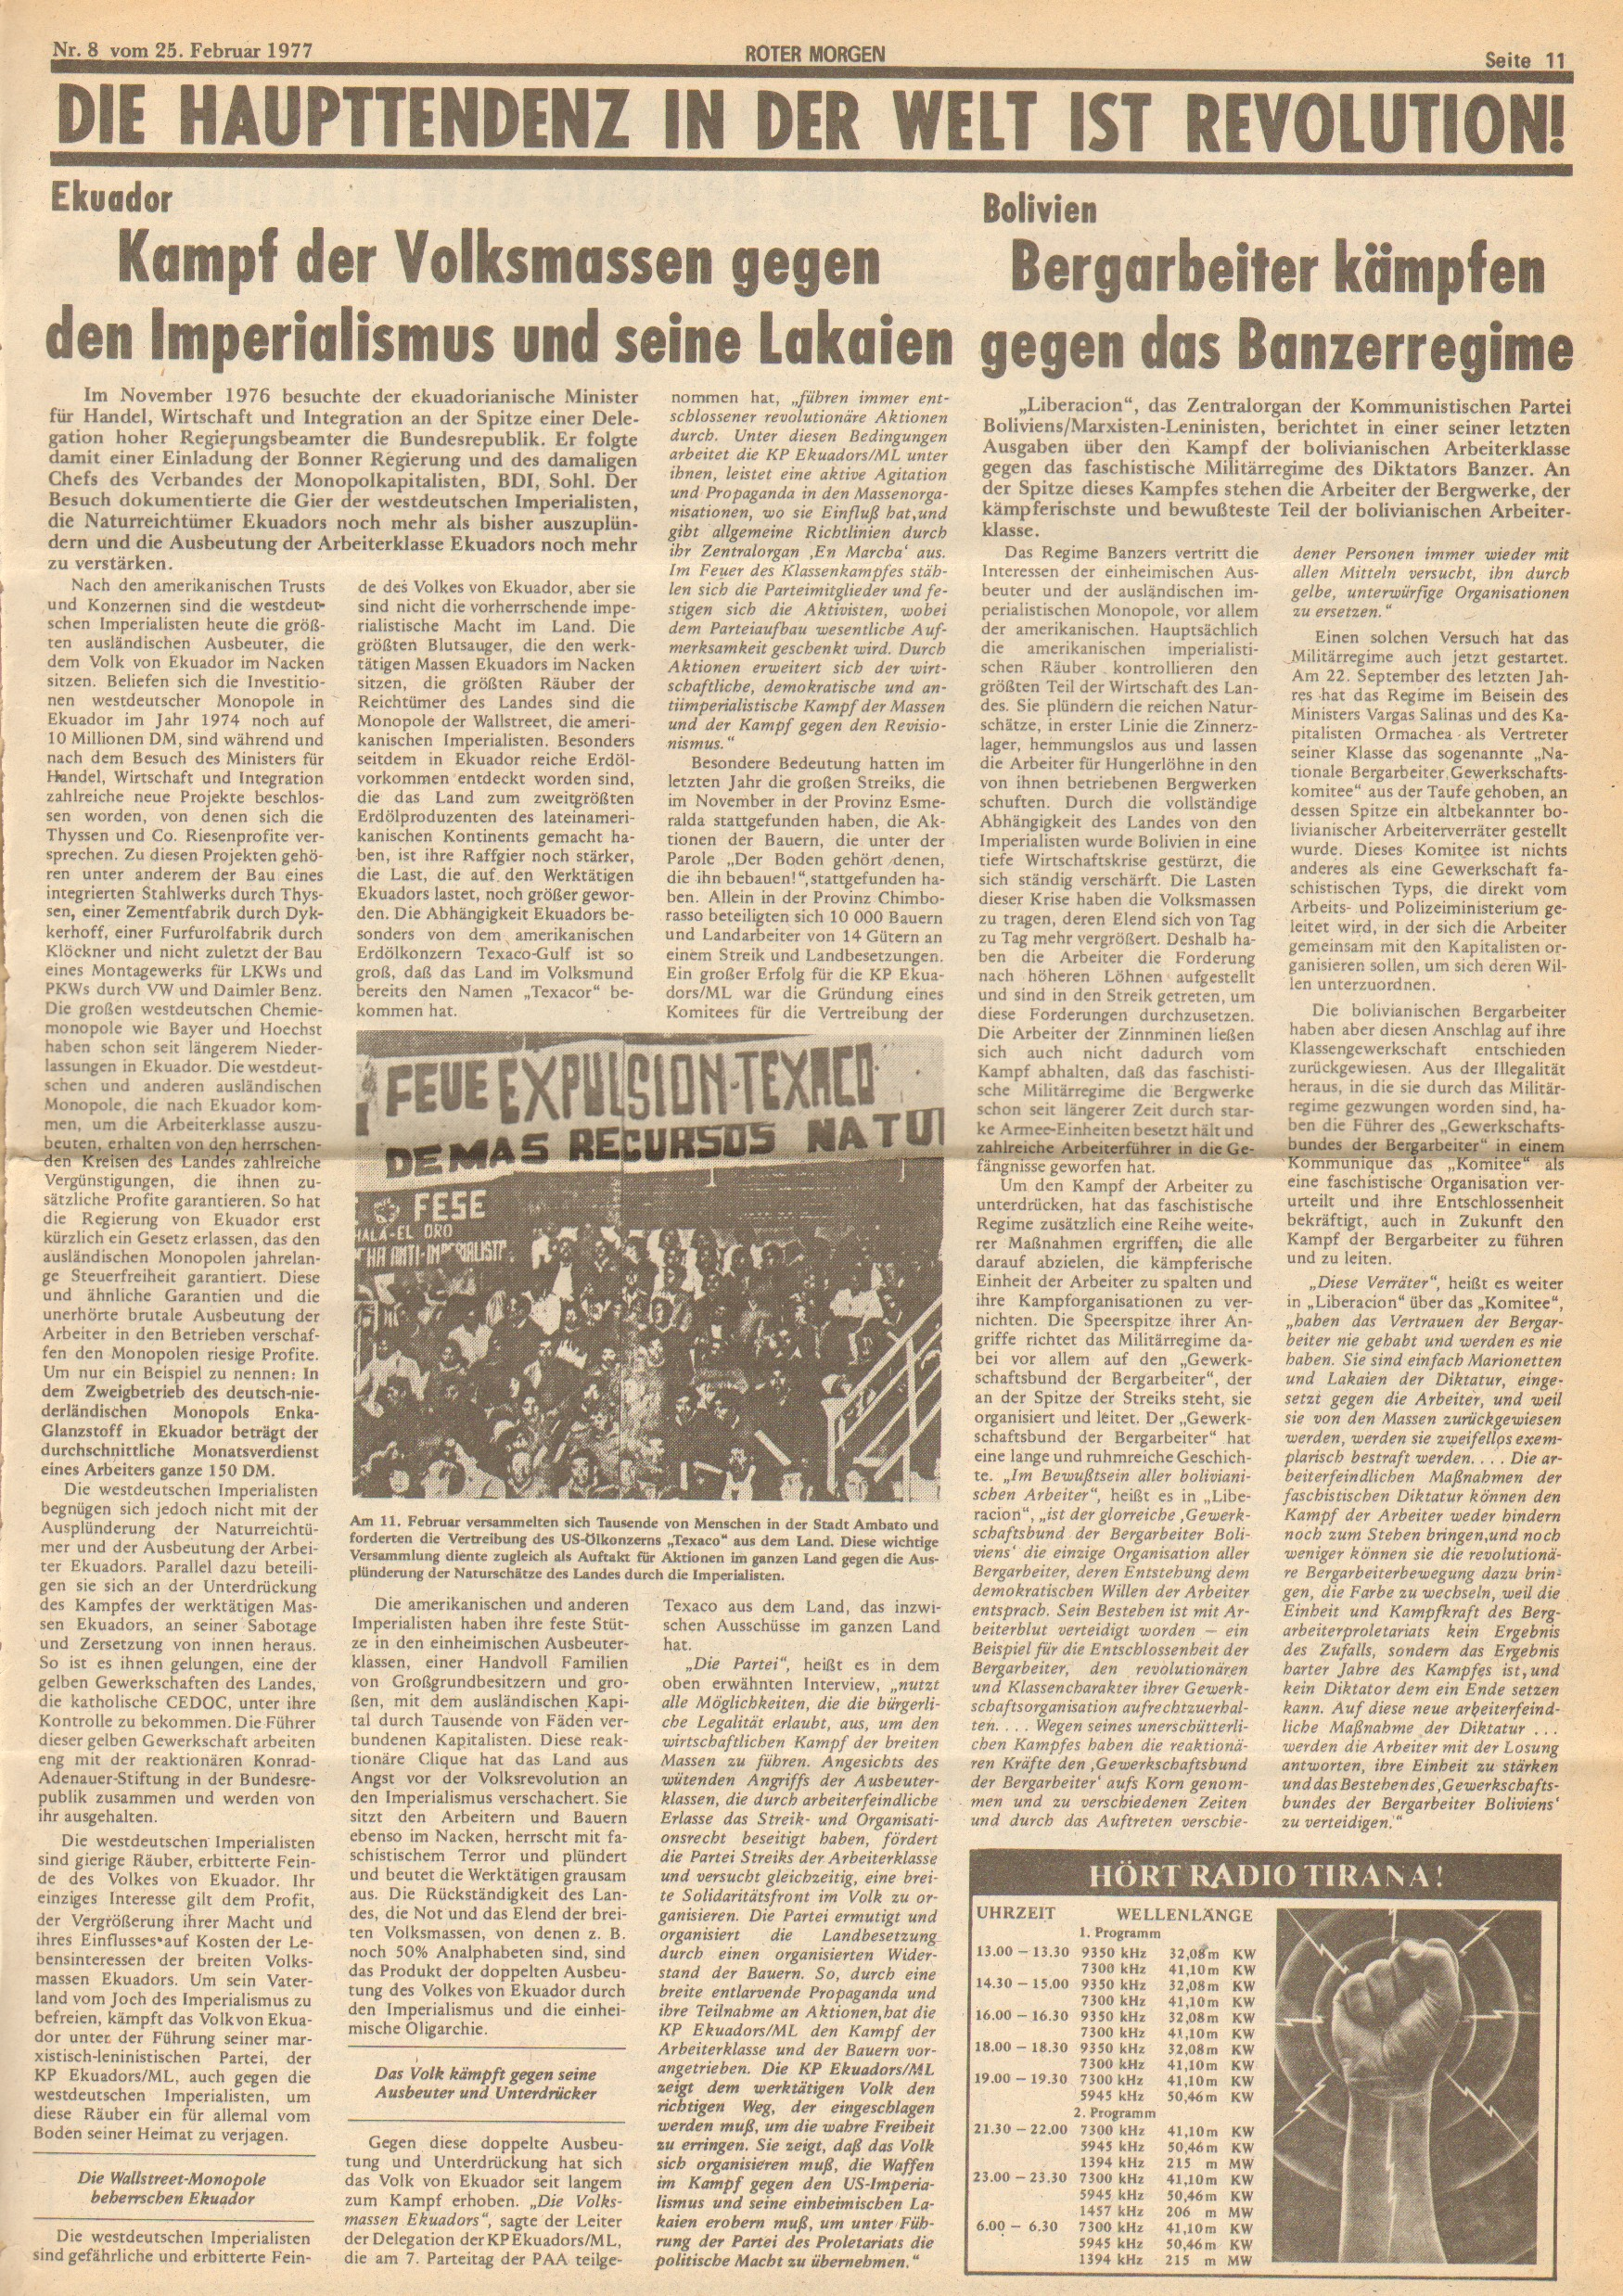 Roter Morgen, 11. Jg.,25. Februar 1977, Nr. 8, Seite 11